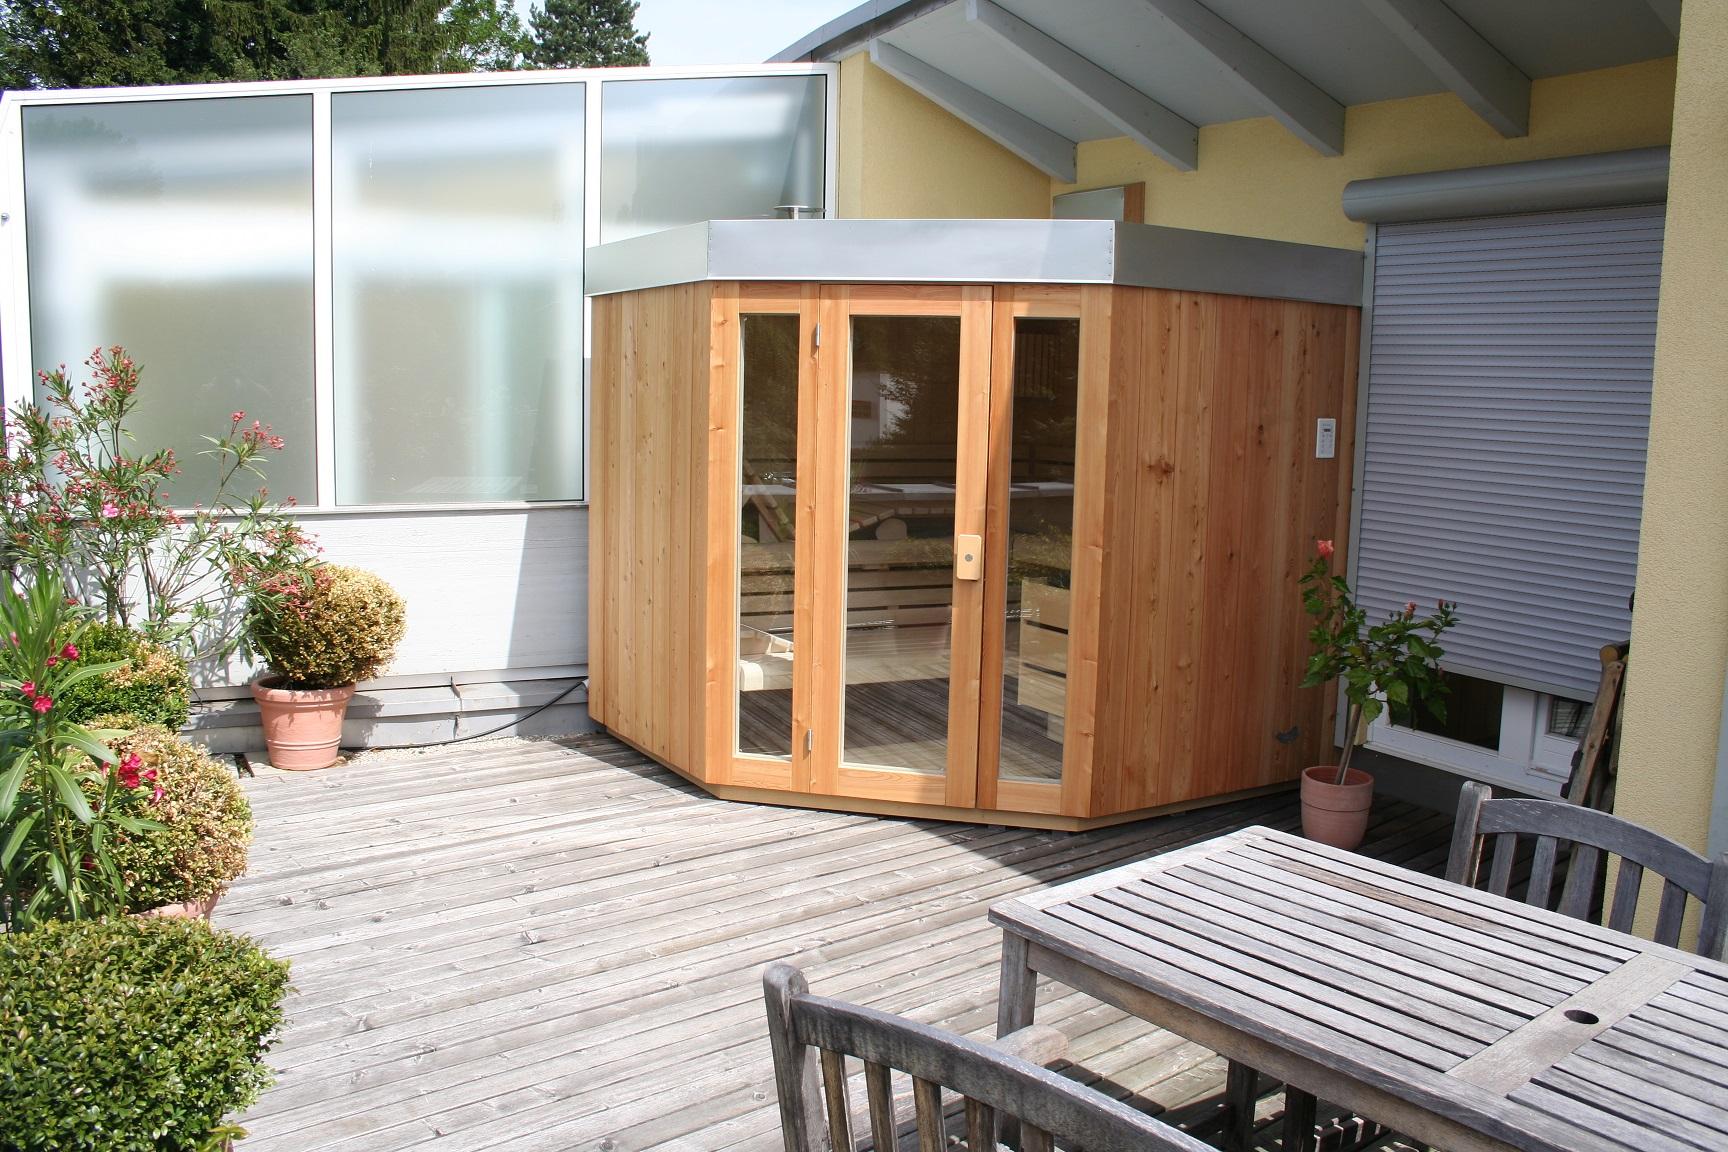 aussensauna modern free moderne gartensauna aussensauna saunahaus gartenhaus with aussensauna. Black Bedroom Furniture Sets. Home Design Ideas